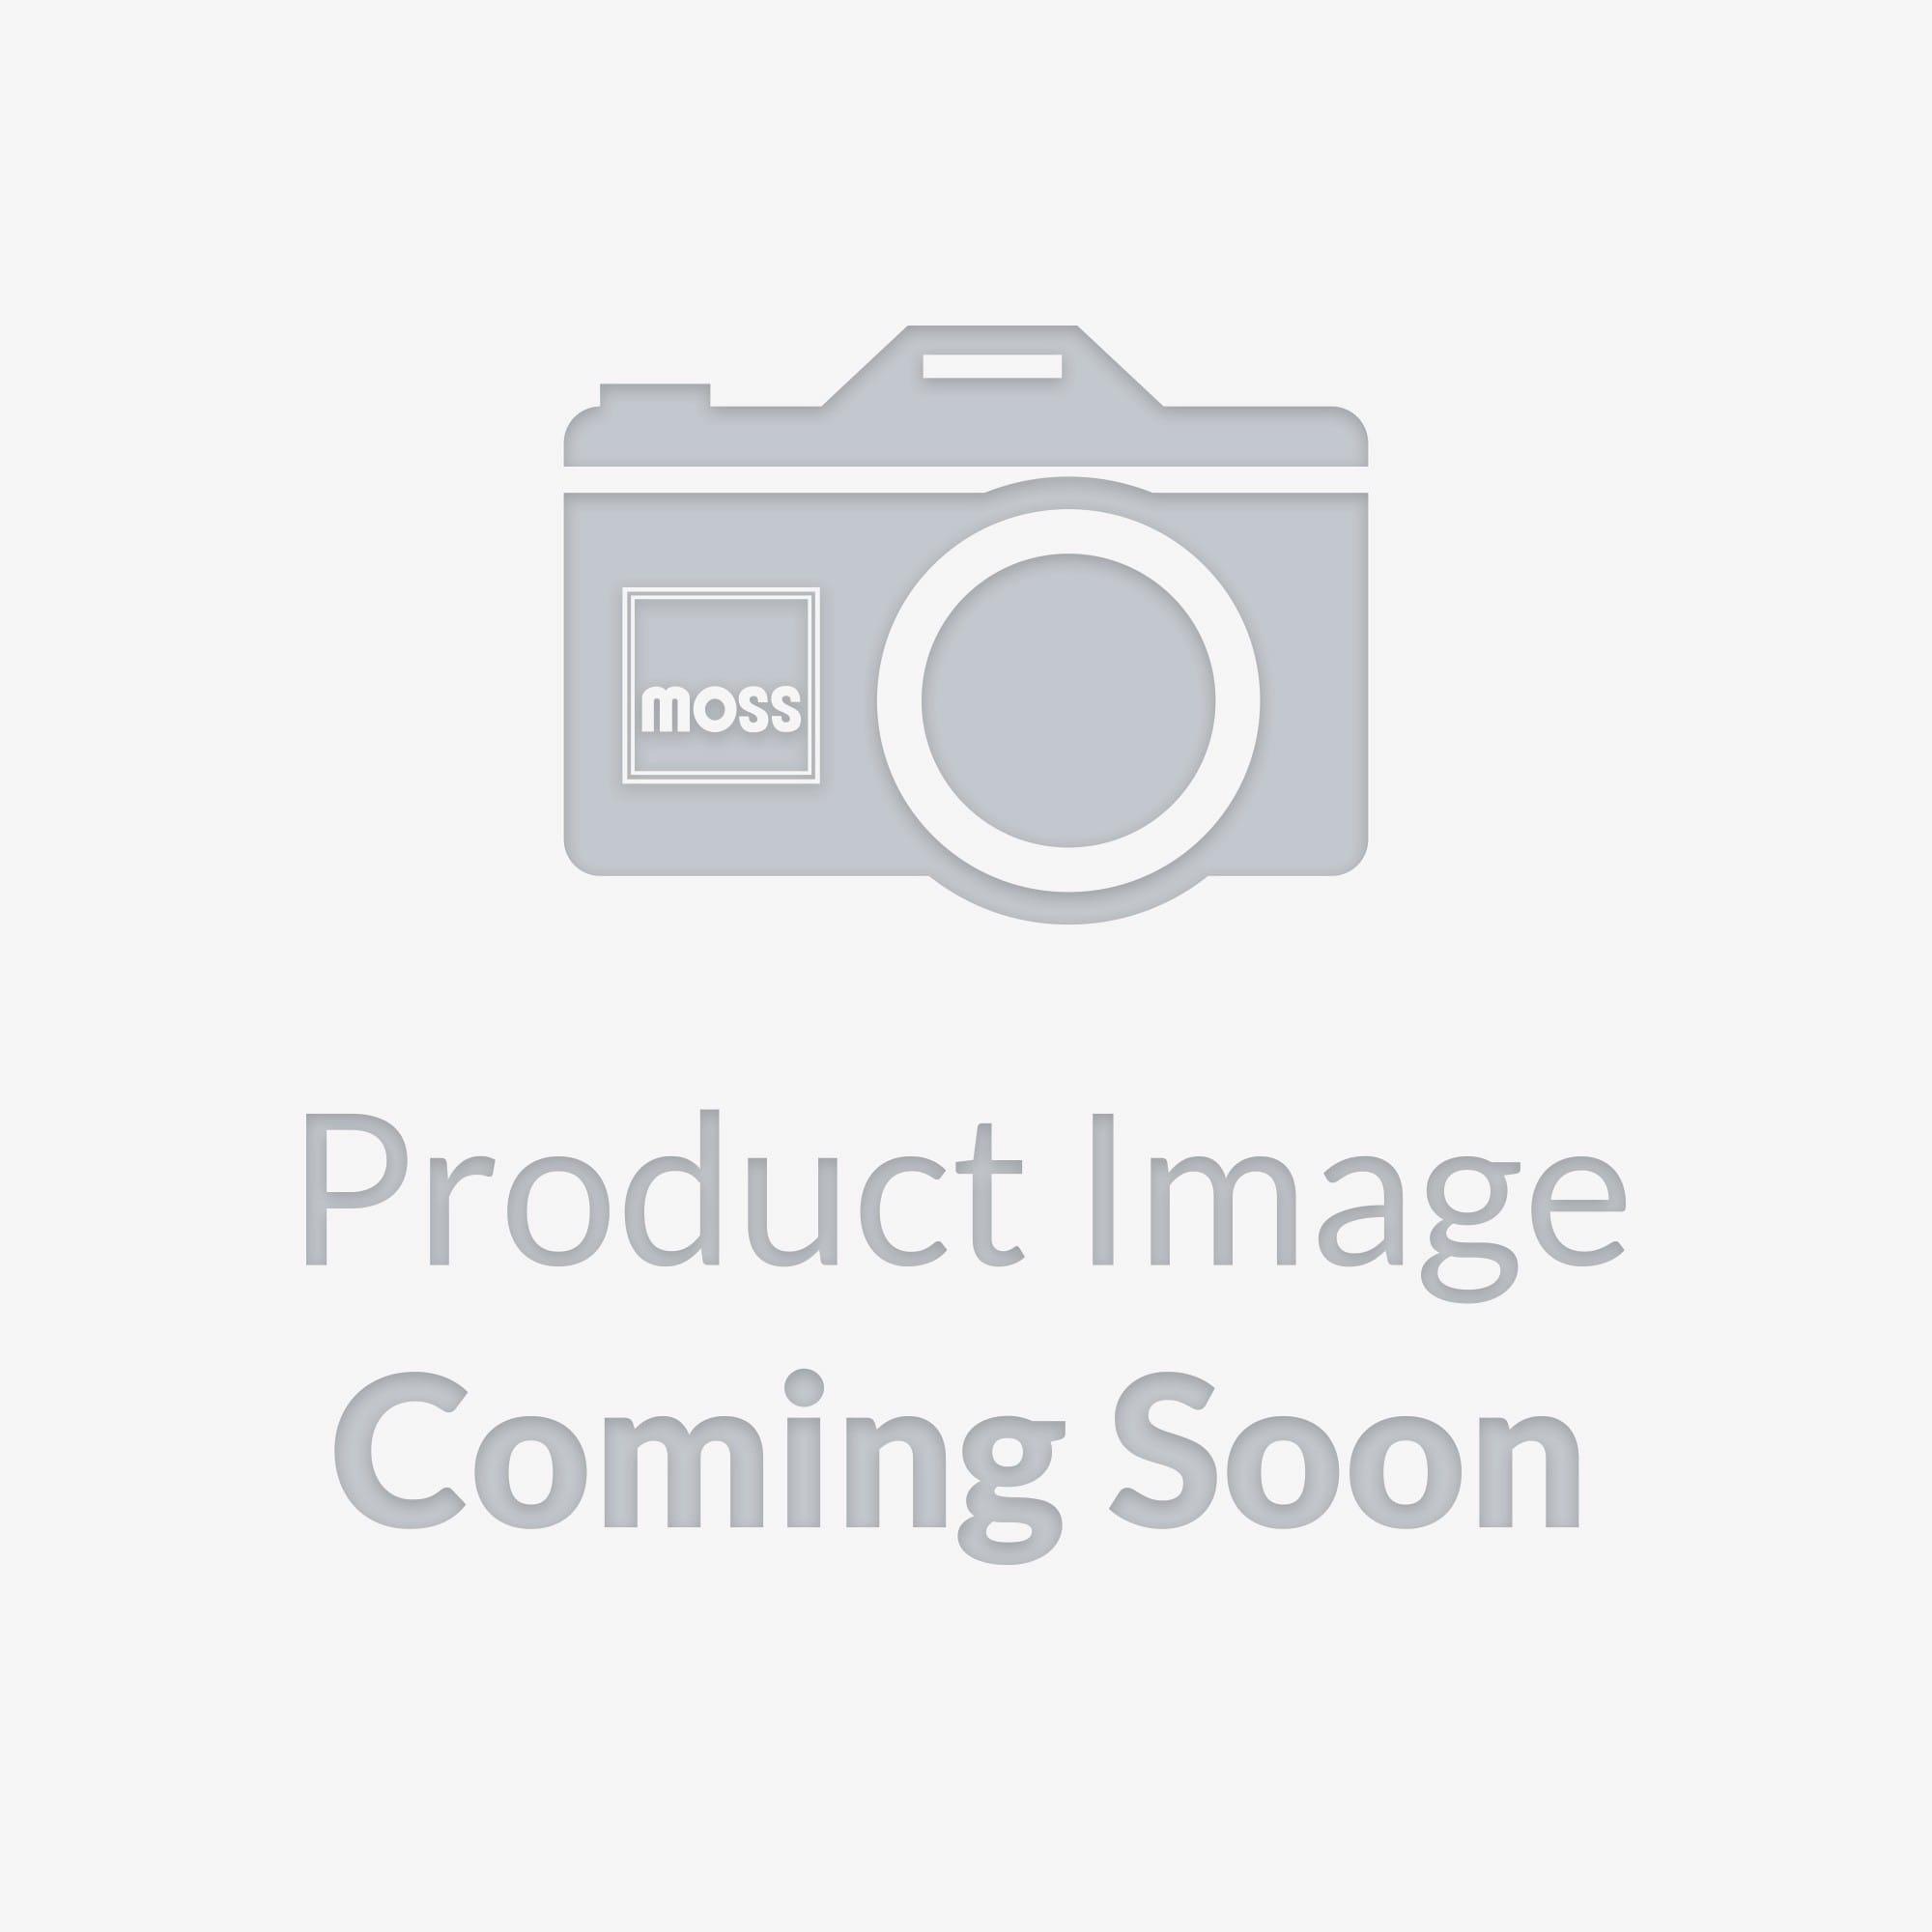 902 968 hella vision plus halogen 7 headlamp mossmiata. Black Bedroom Furniture Sets. Home Design Ideas